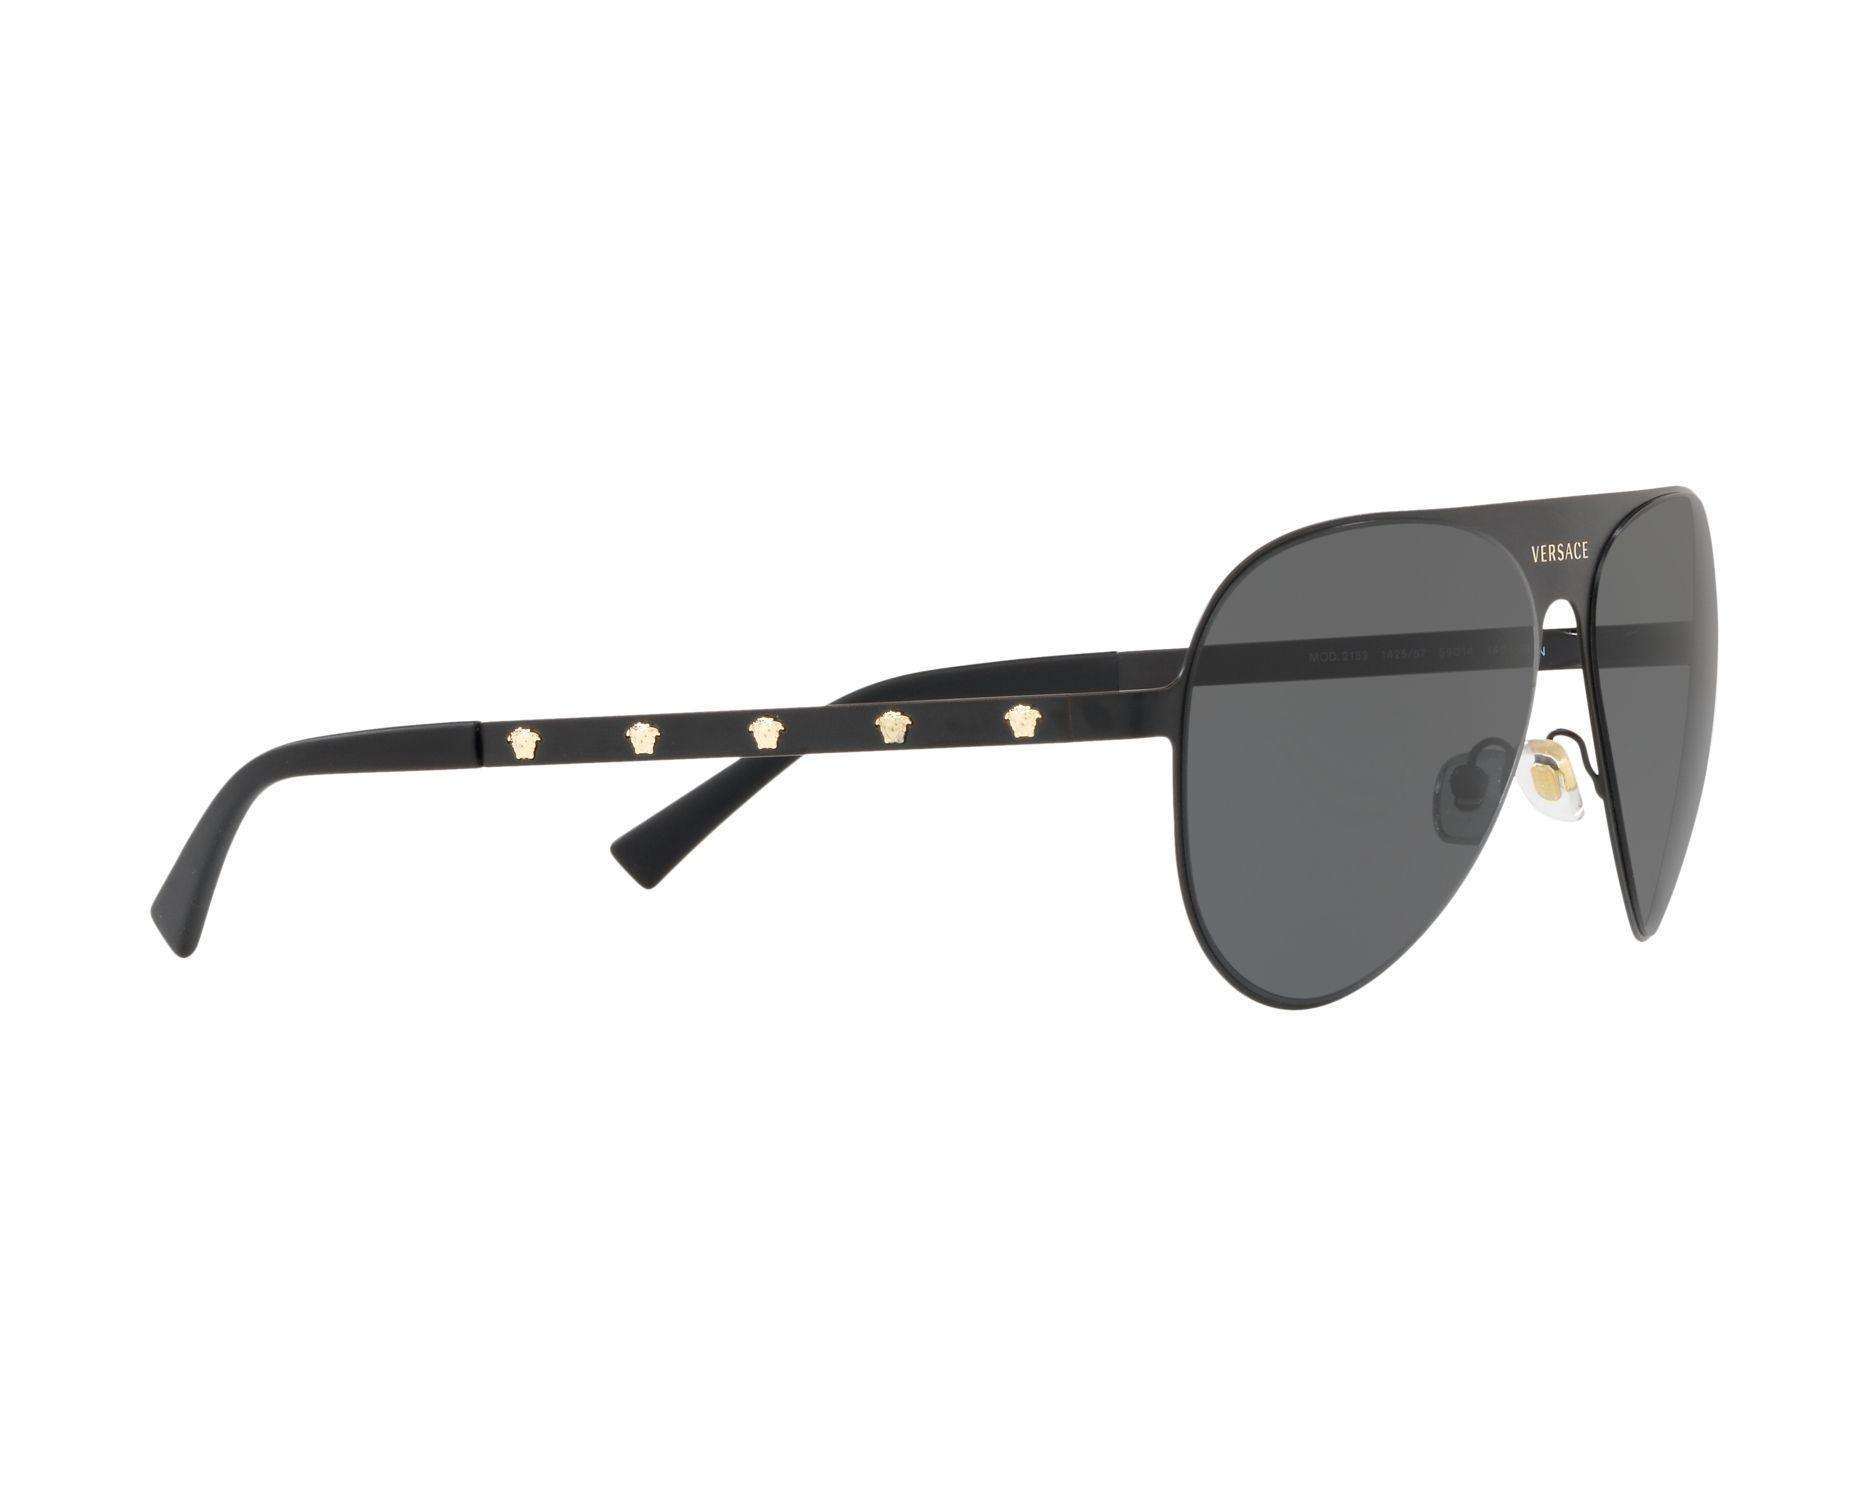 e761a5c8c6a Sunglasses Versace VE-2189 142587 59-14 Black Gold 360 degree view 11